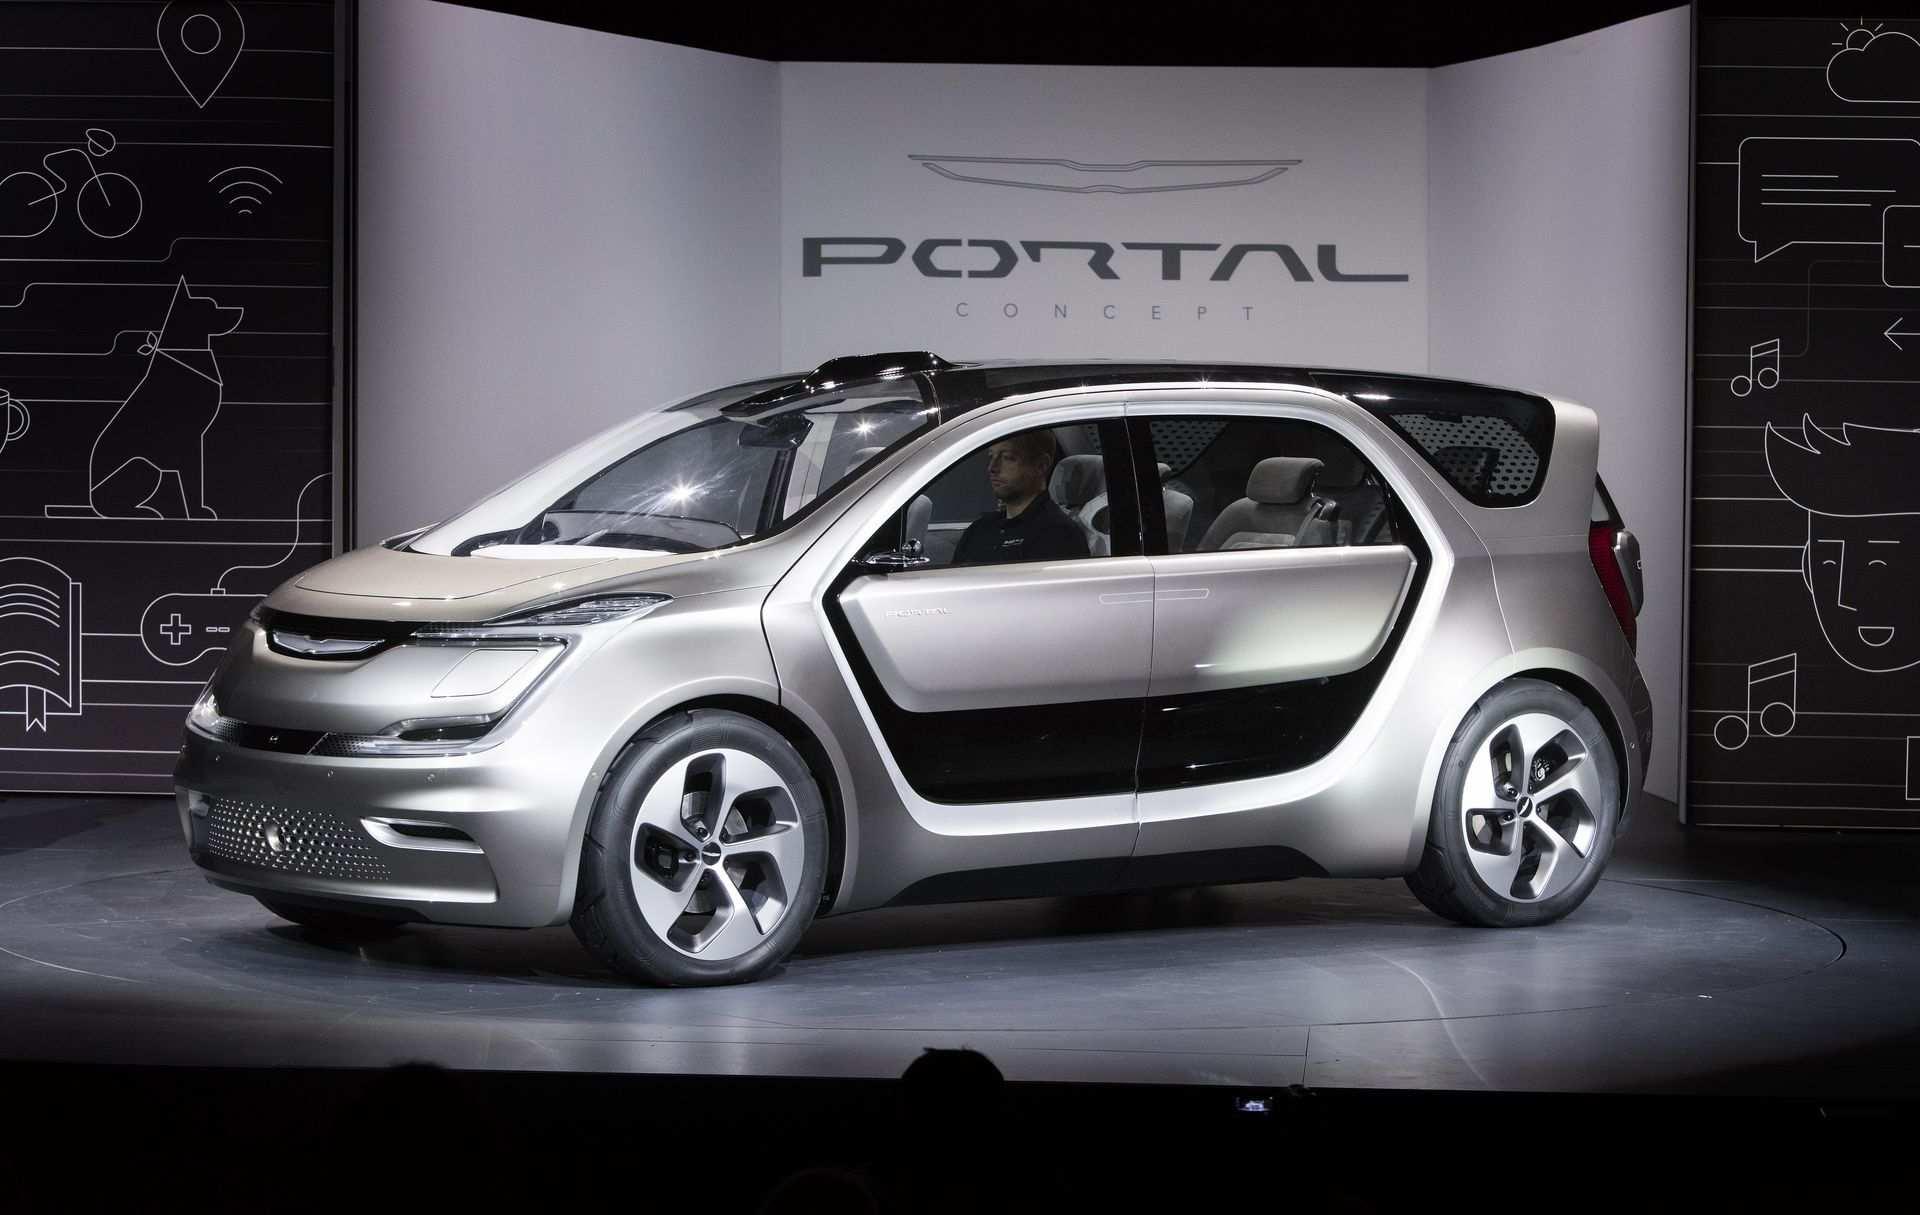 93 New 2019 Chrysler Portal Overview by 2019 Chrysler Portal